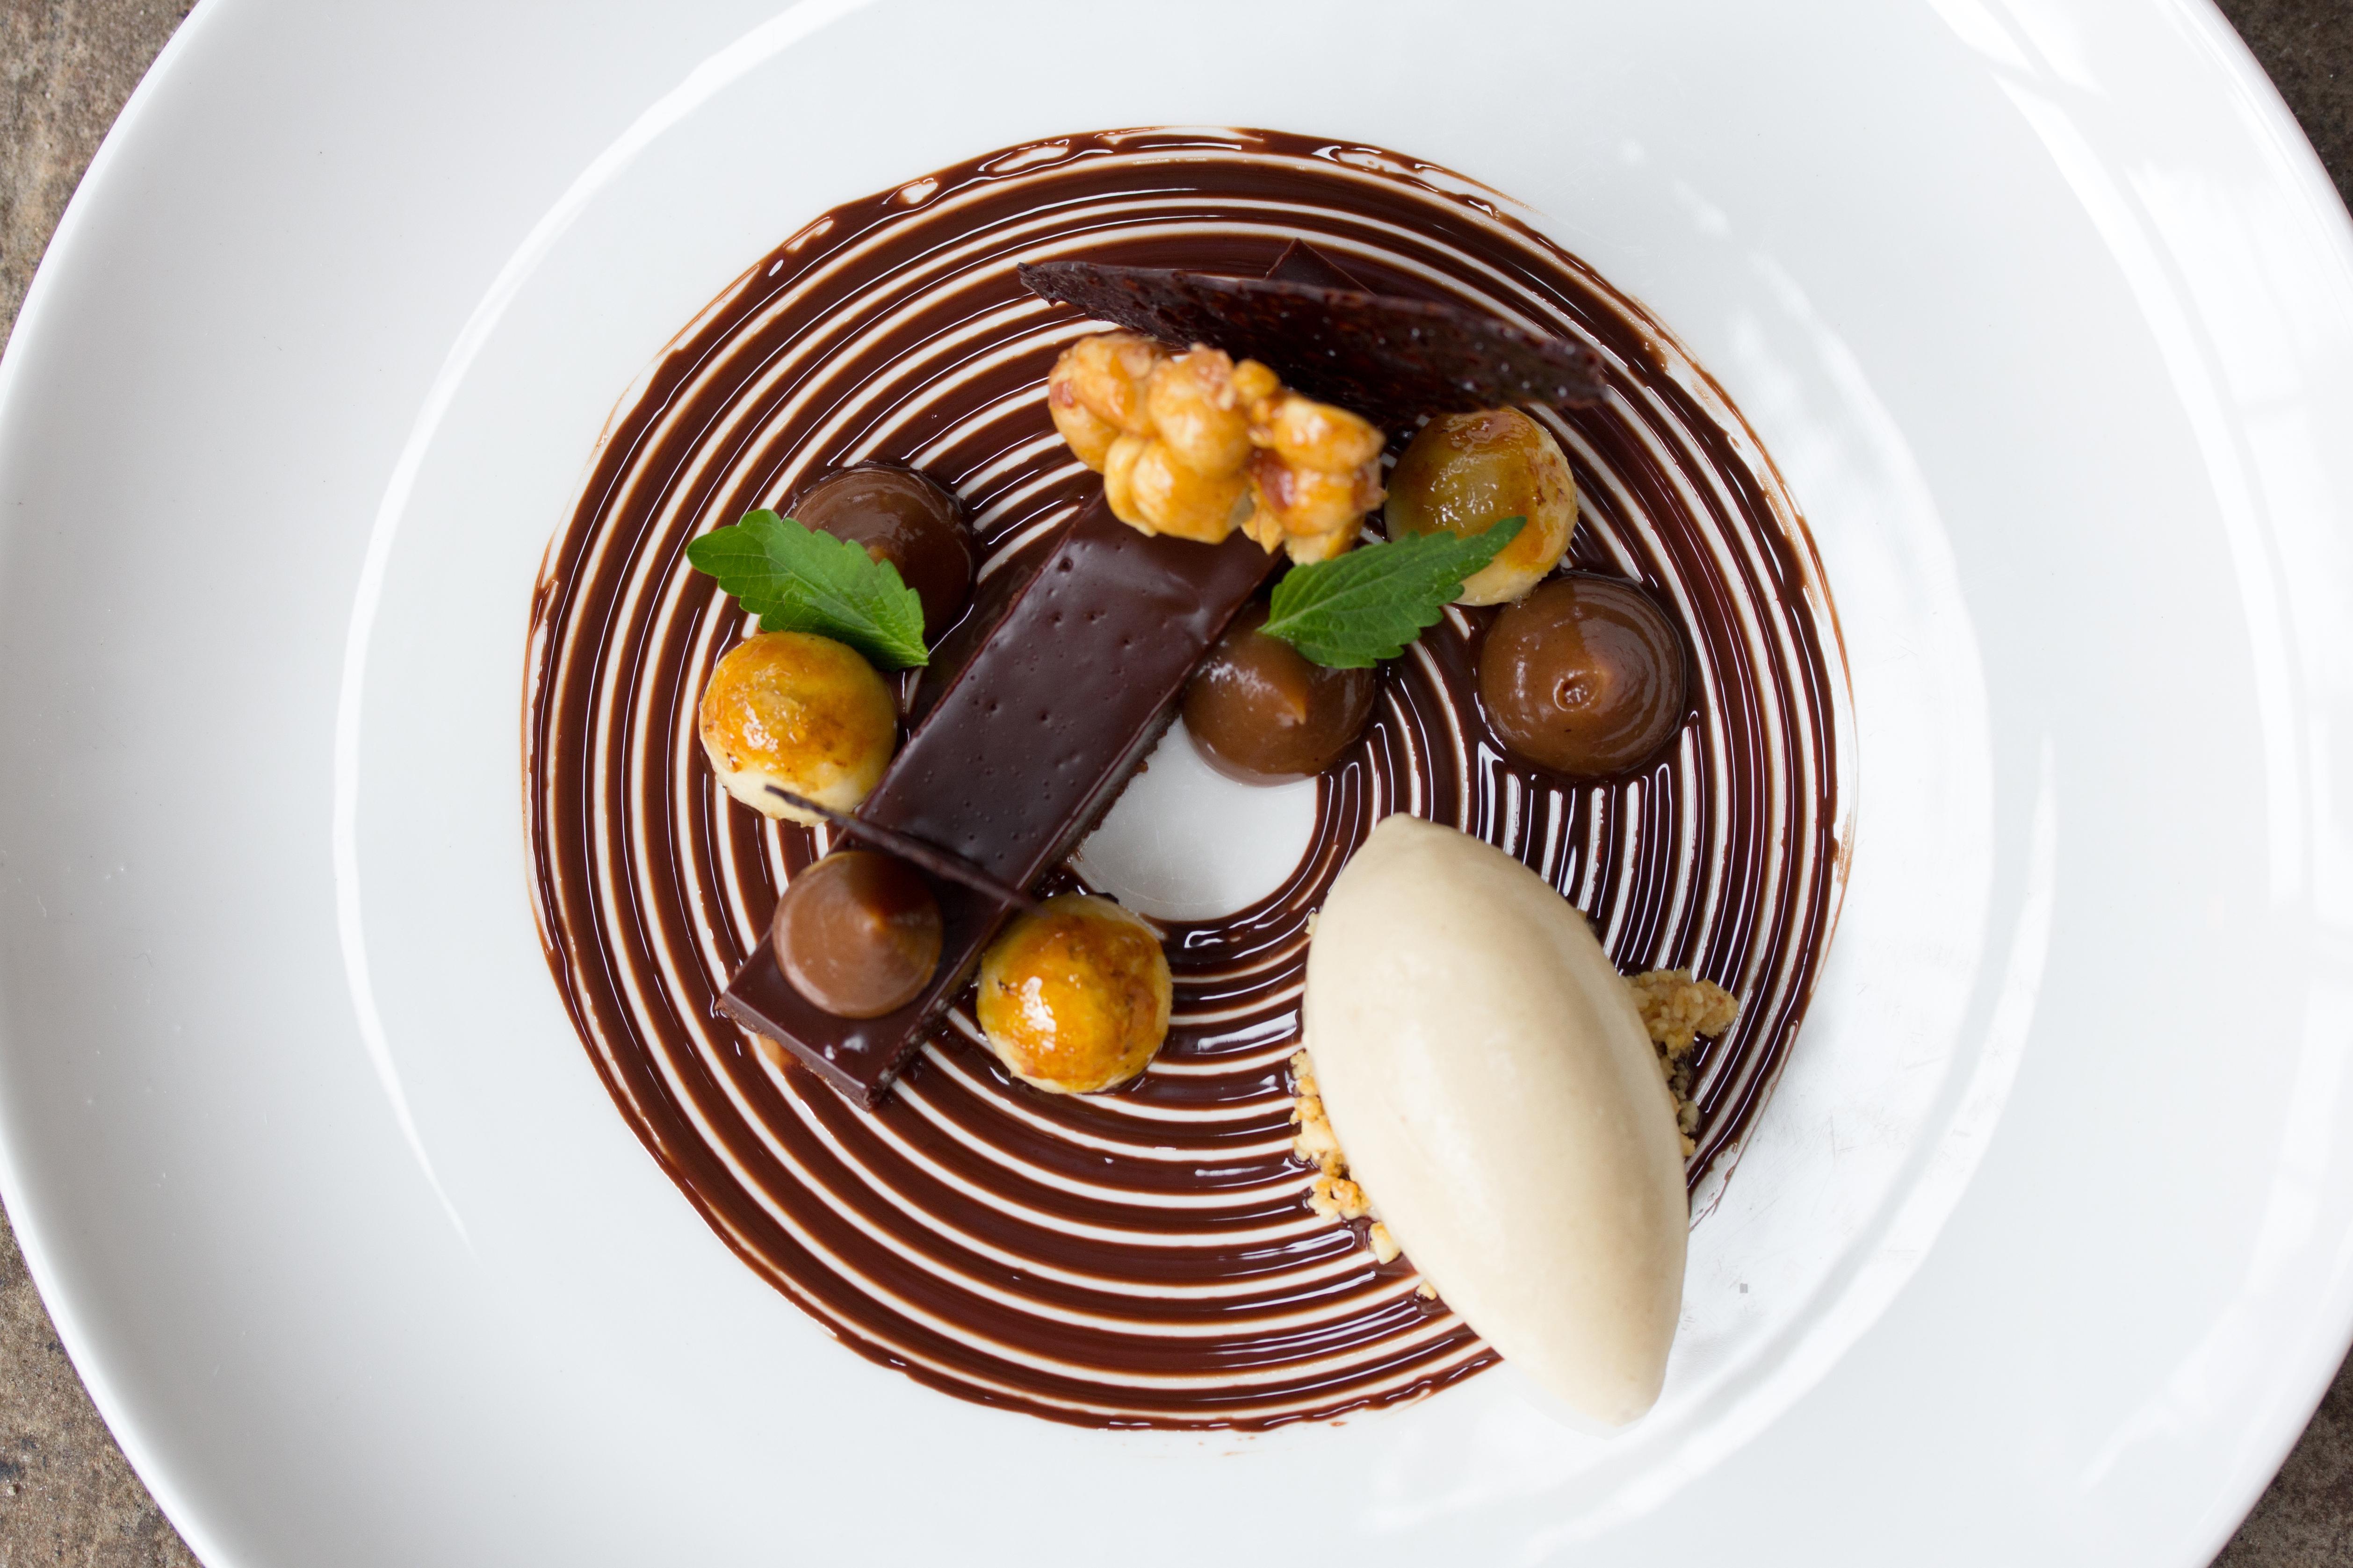 Auberge-du-Pommier-Dessert-Spring-Chocolate-ADP-5